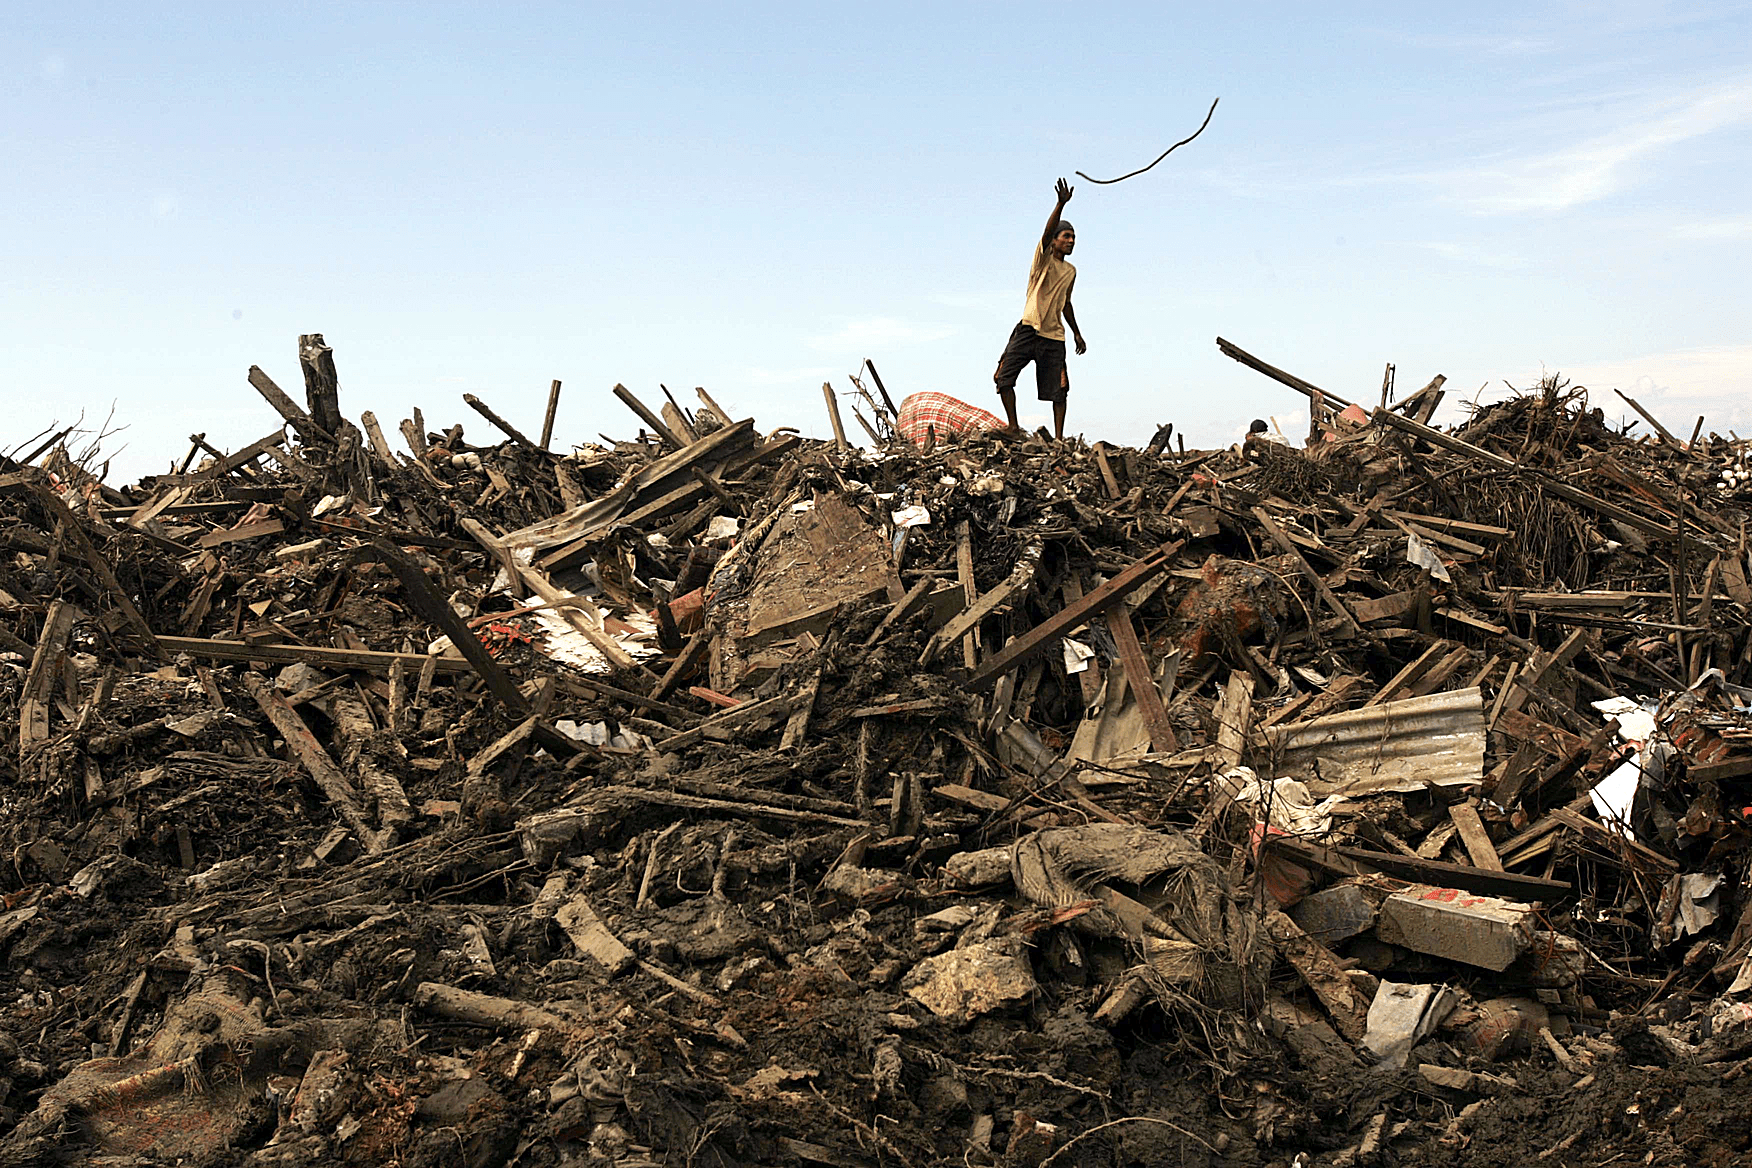 Tsunami damage in Banda Aceh, Indonesia.